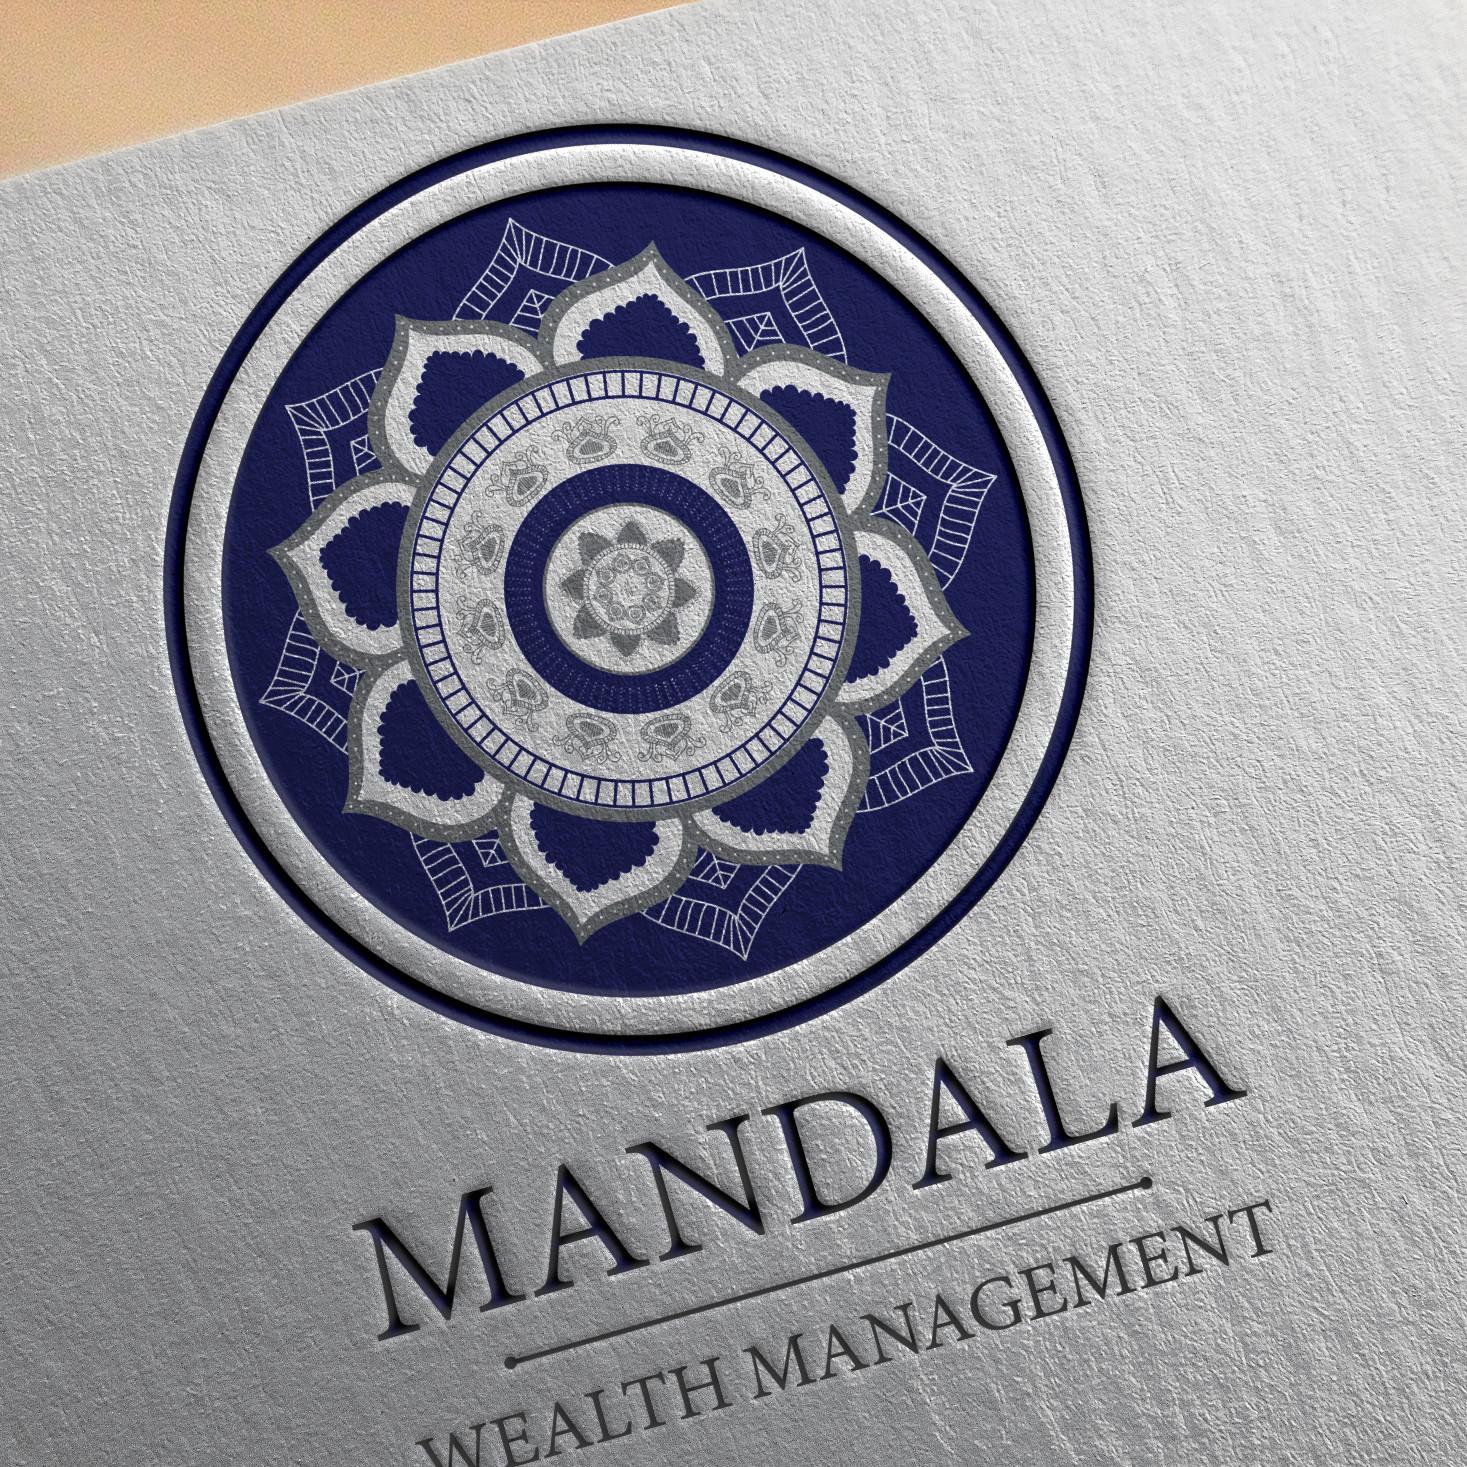 MandalaLogoDesign